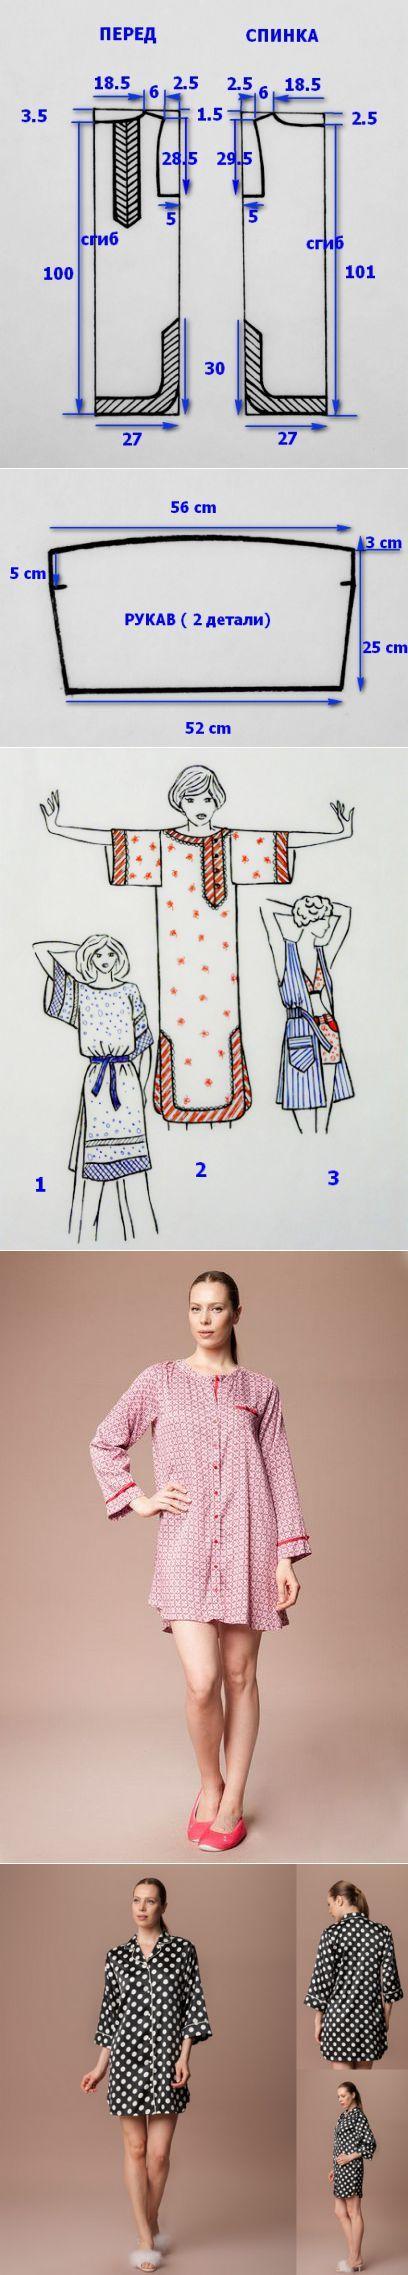 Pattern dress for women, tunics... ♥ Deniz ♥